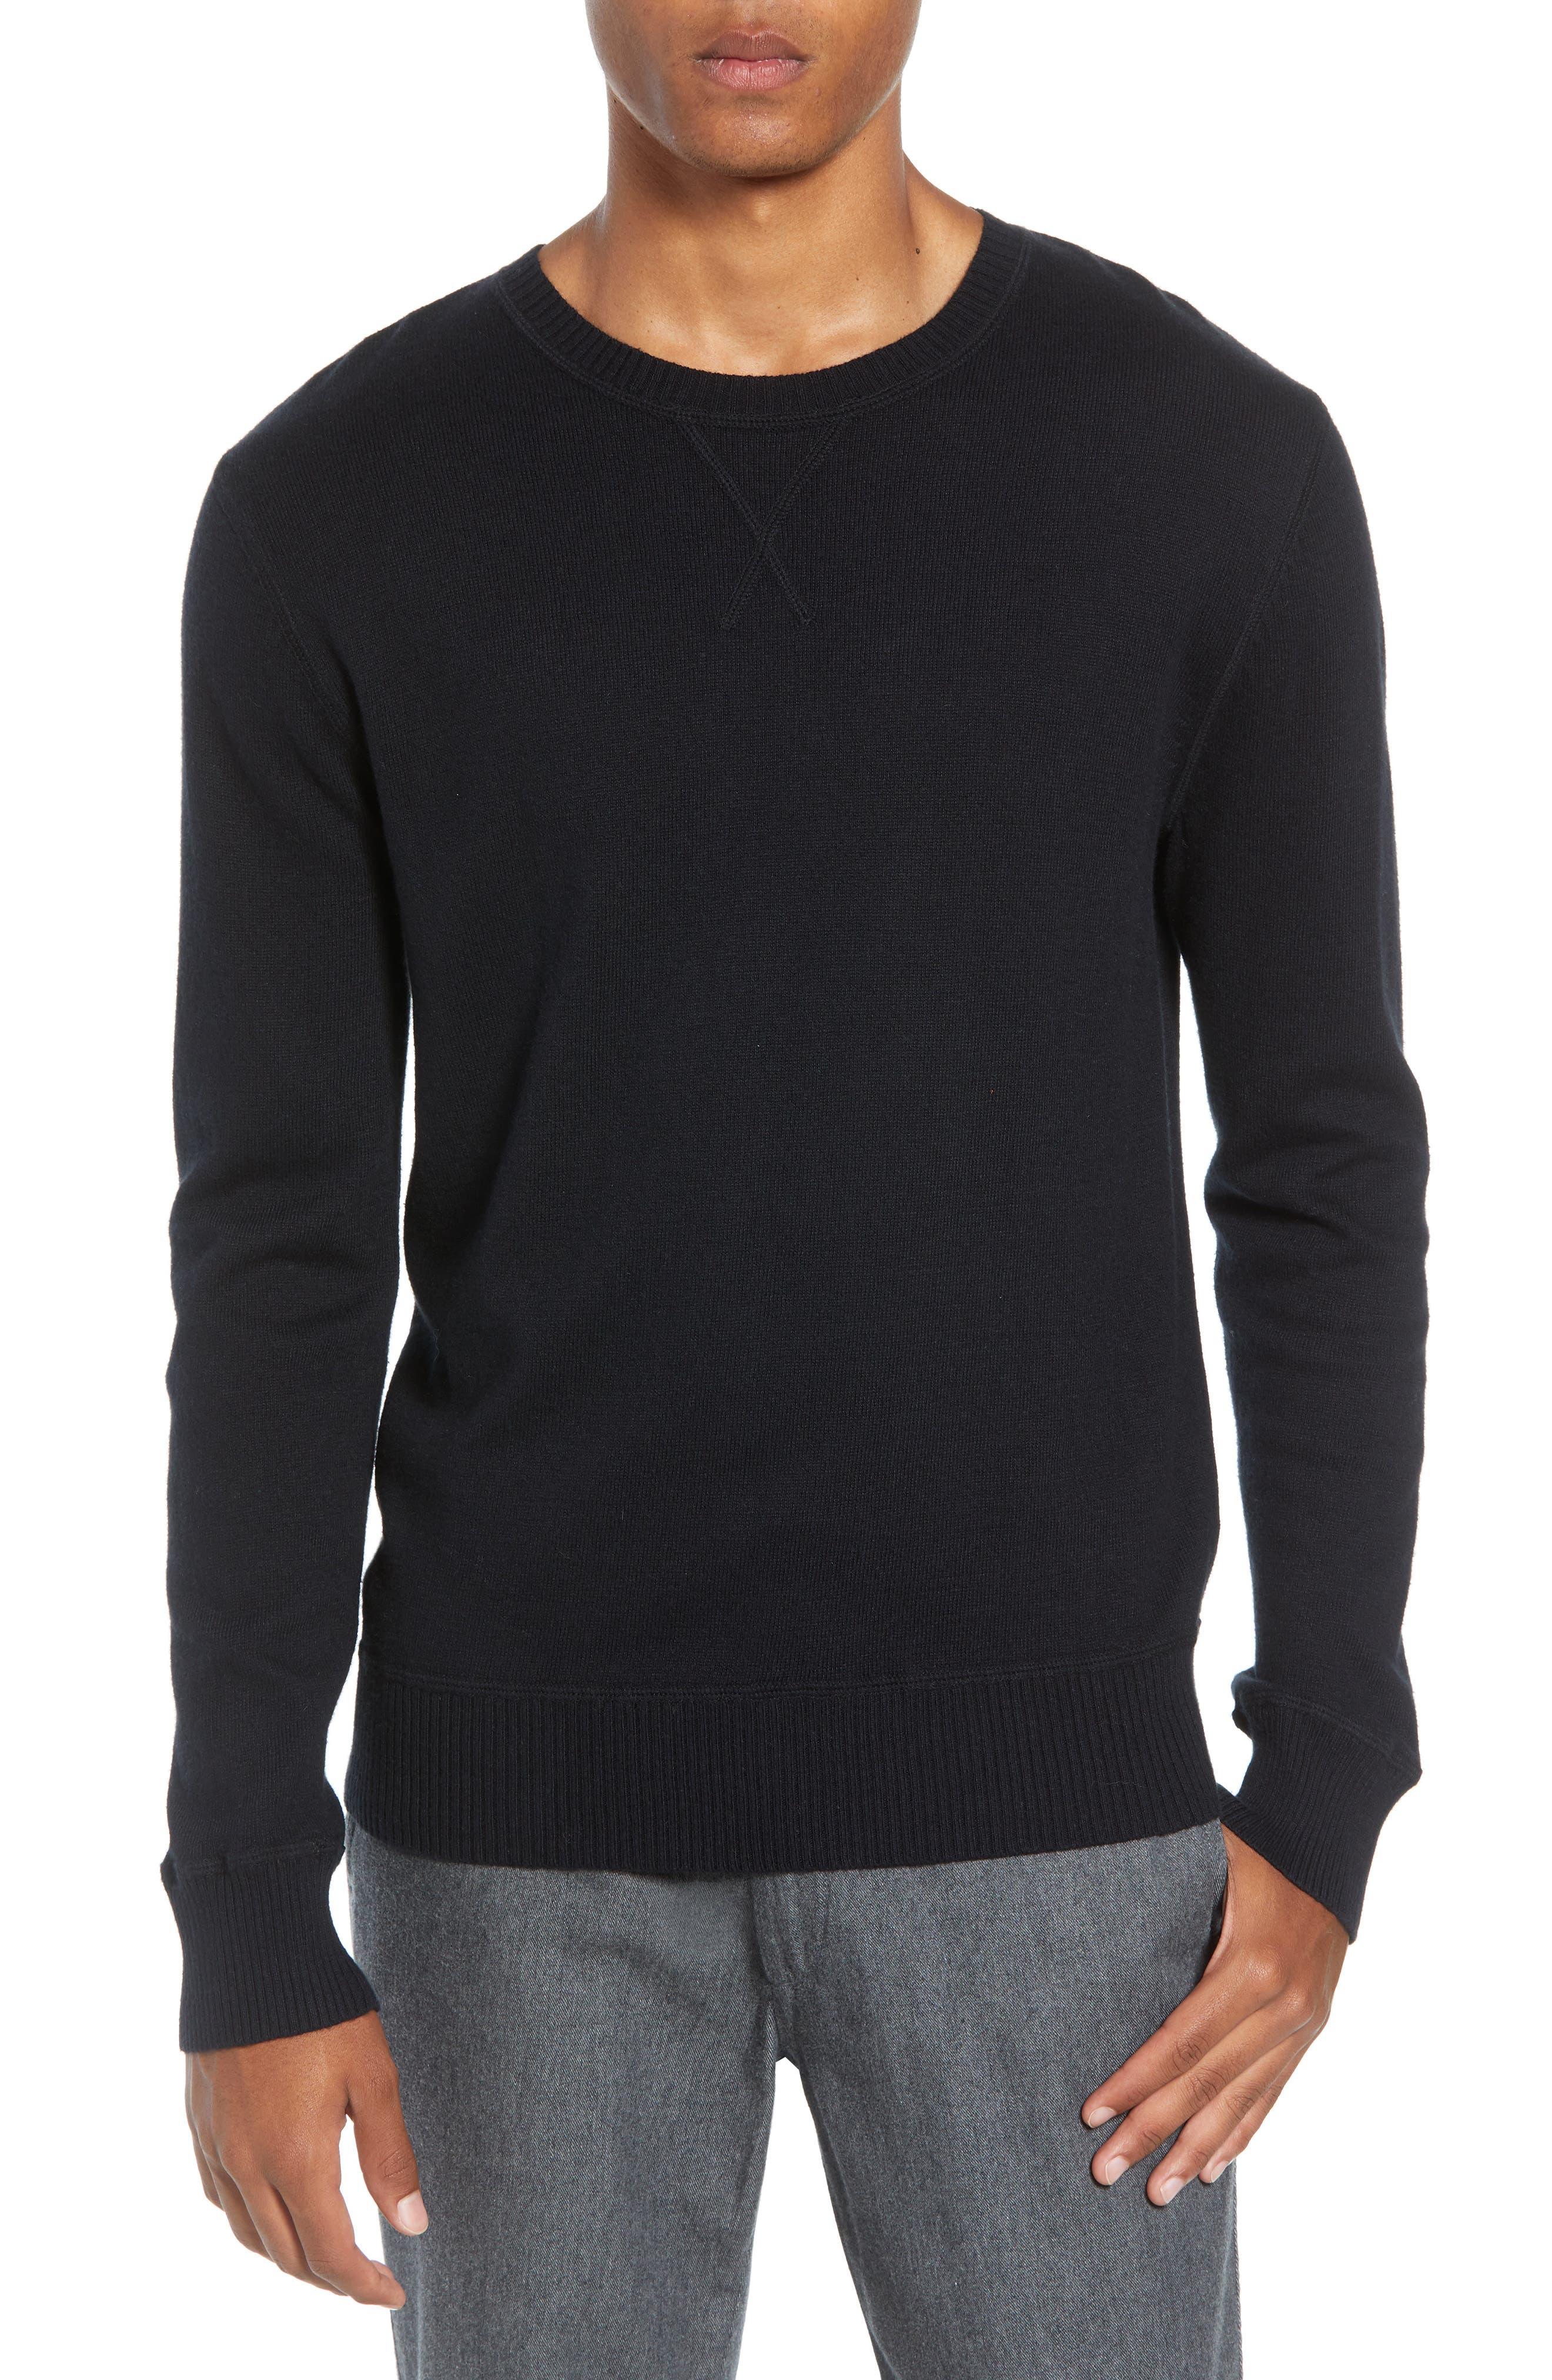 Tournament Slim Fit Crewneck Sweater,                             Main thumbnail 1, color,                             BLACK